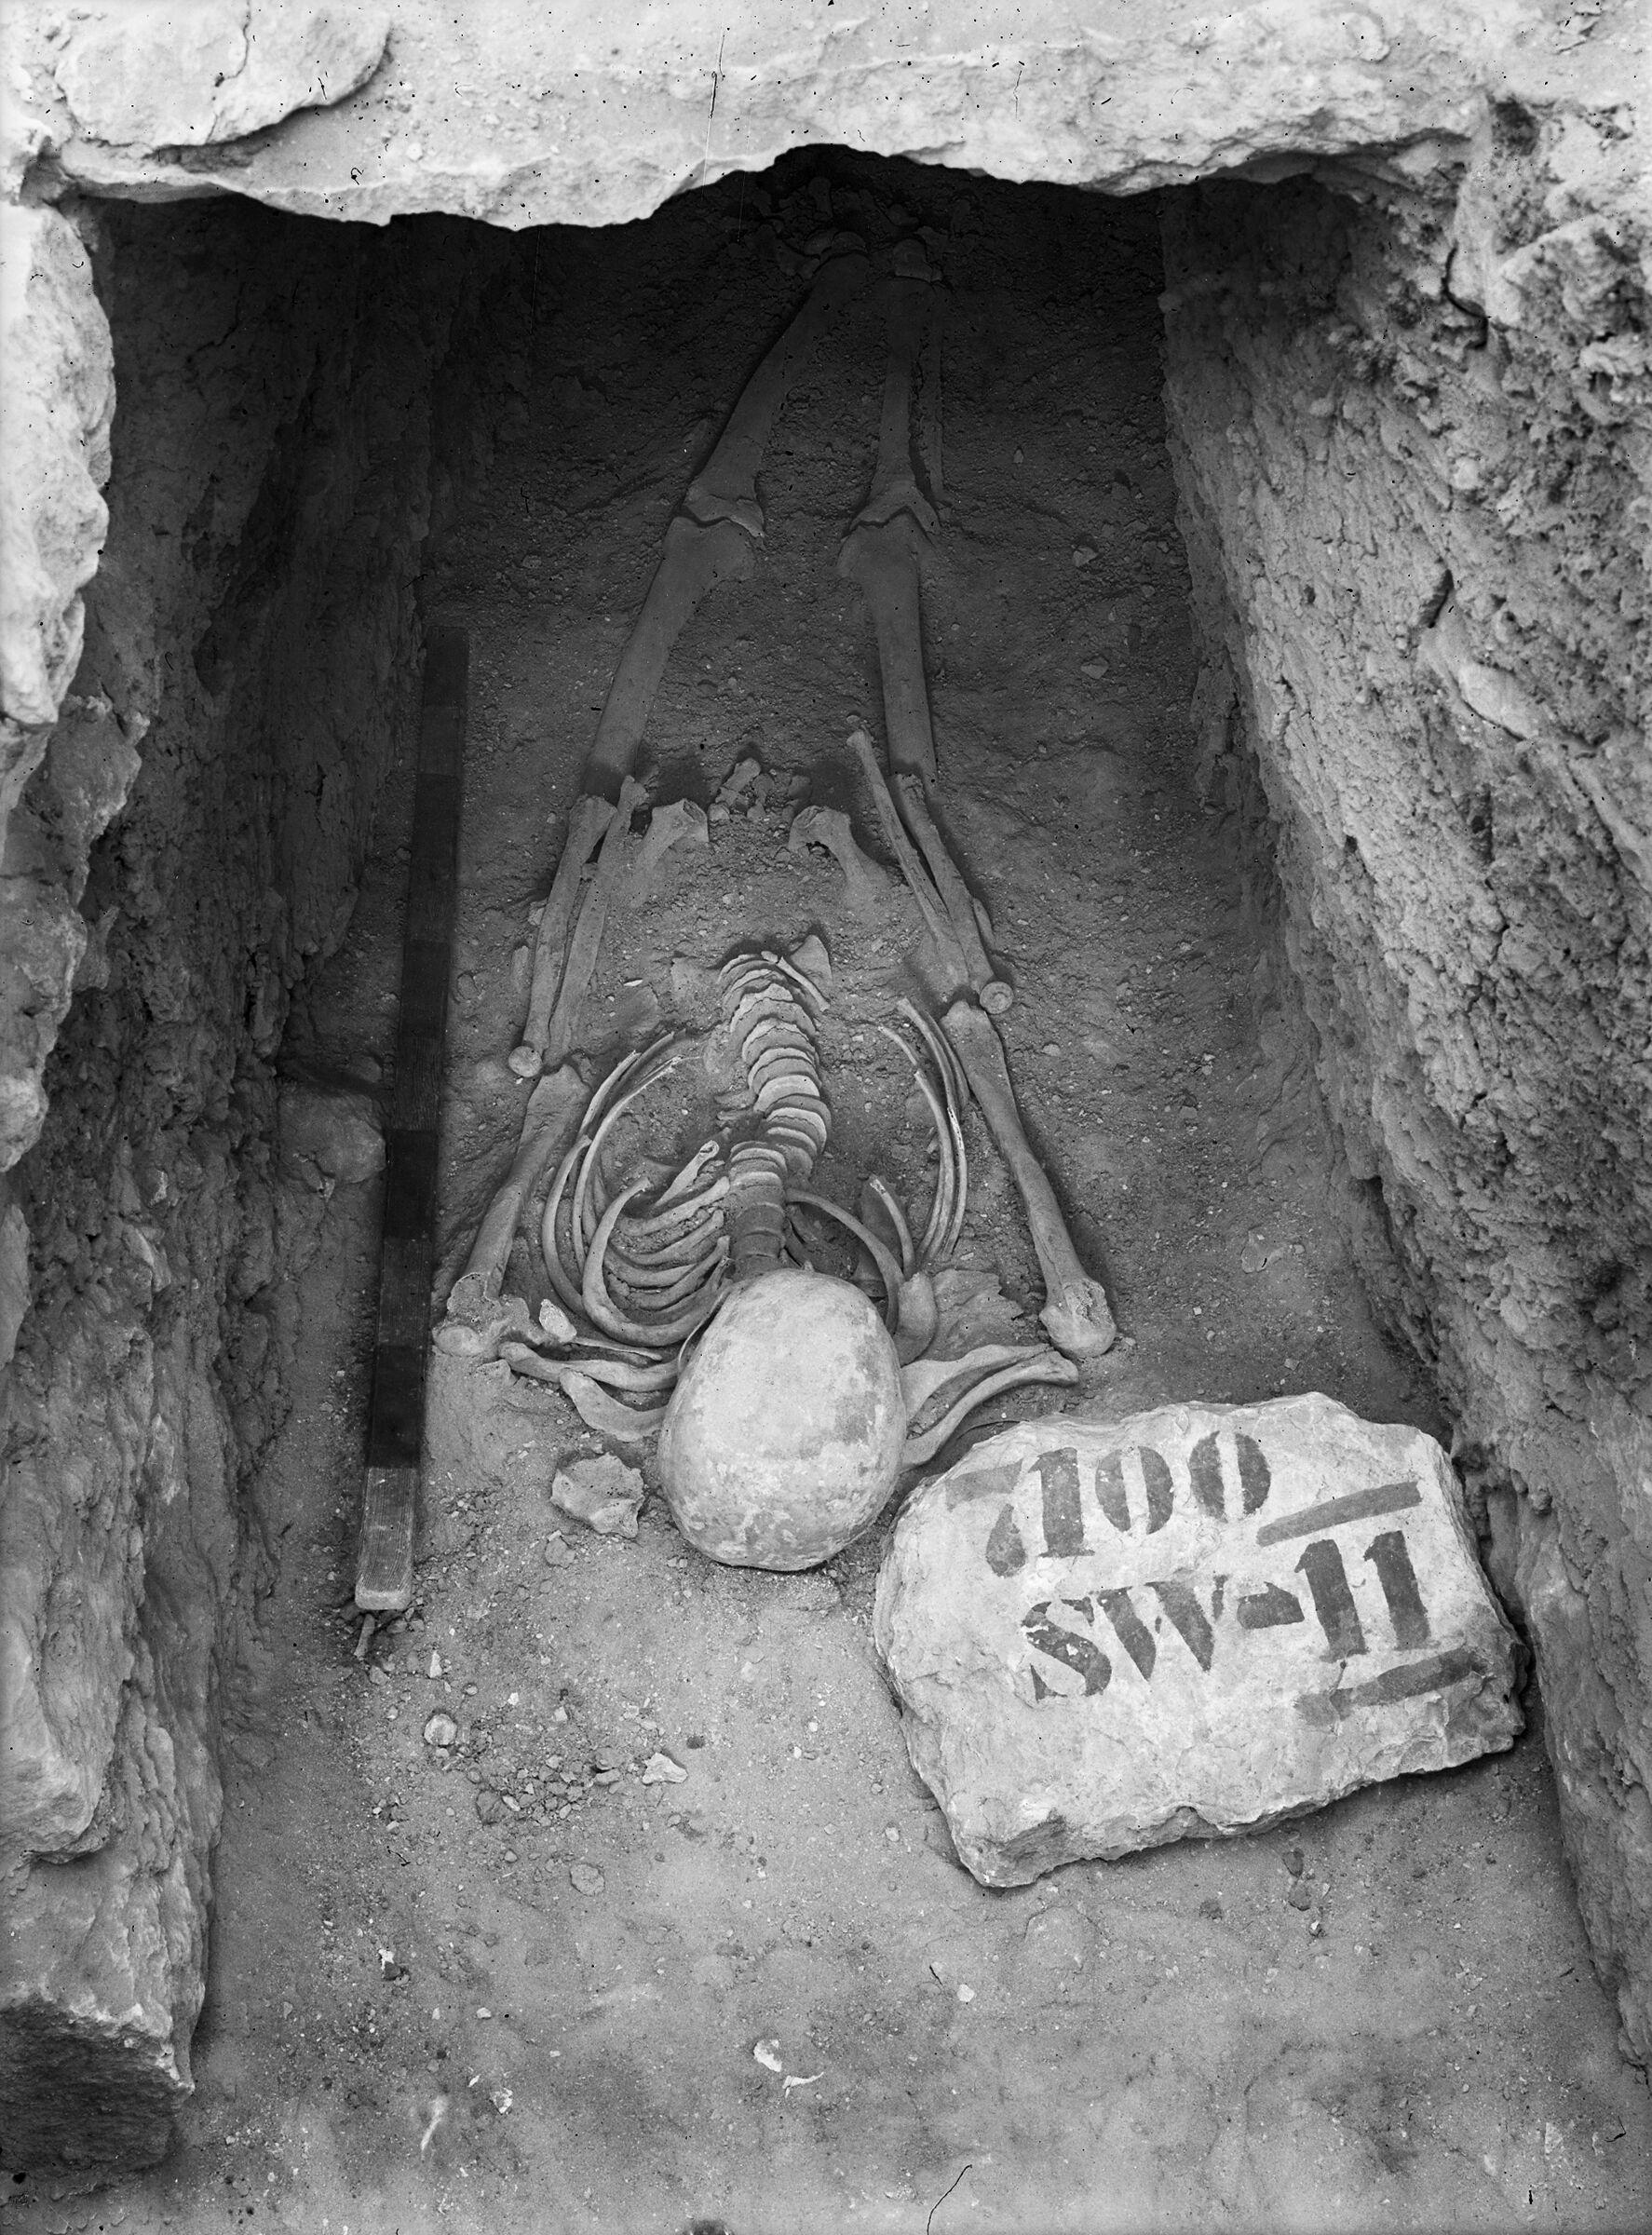 Eastern Cemetery: Site: Giza; View: G 7100 SW II (G 7100 SW 2)